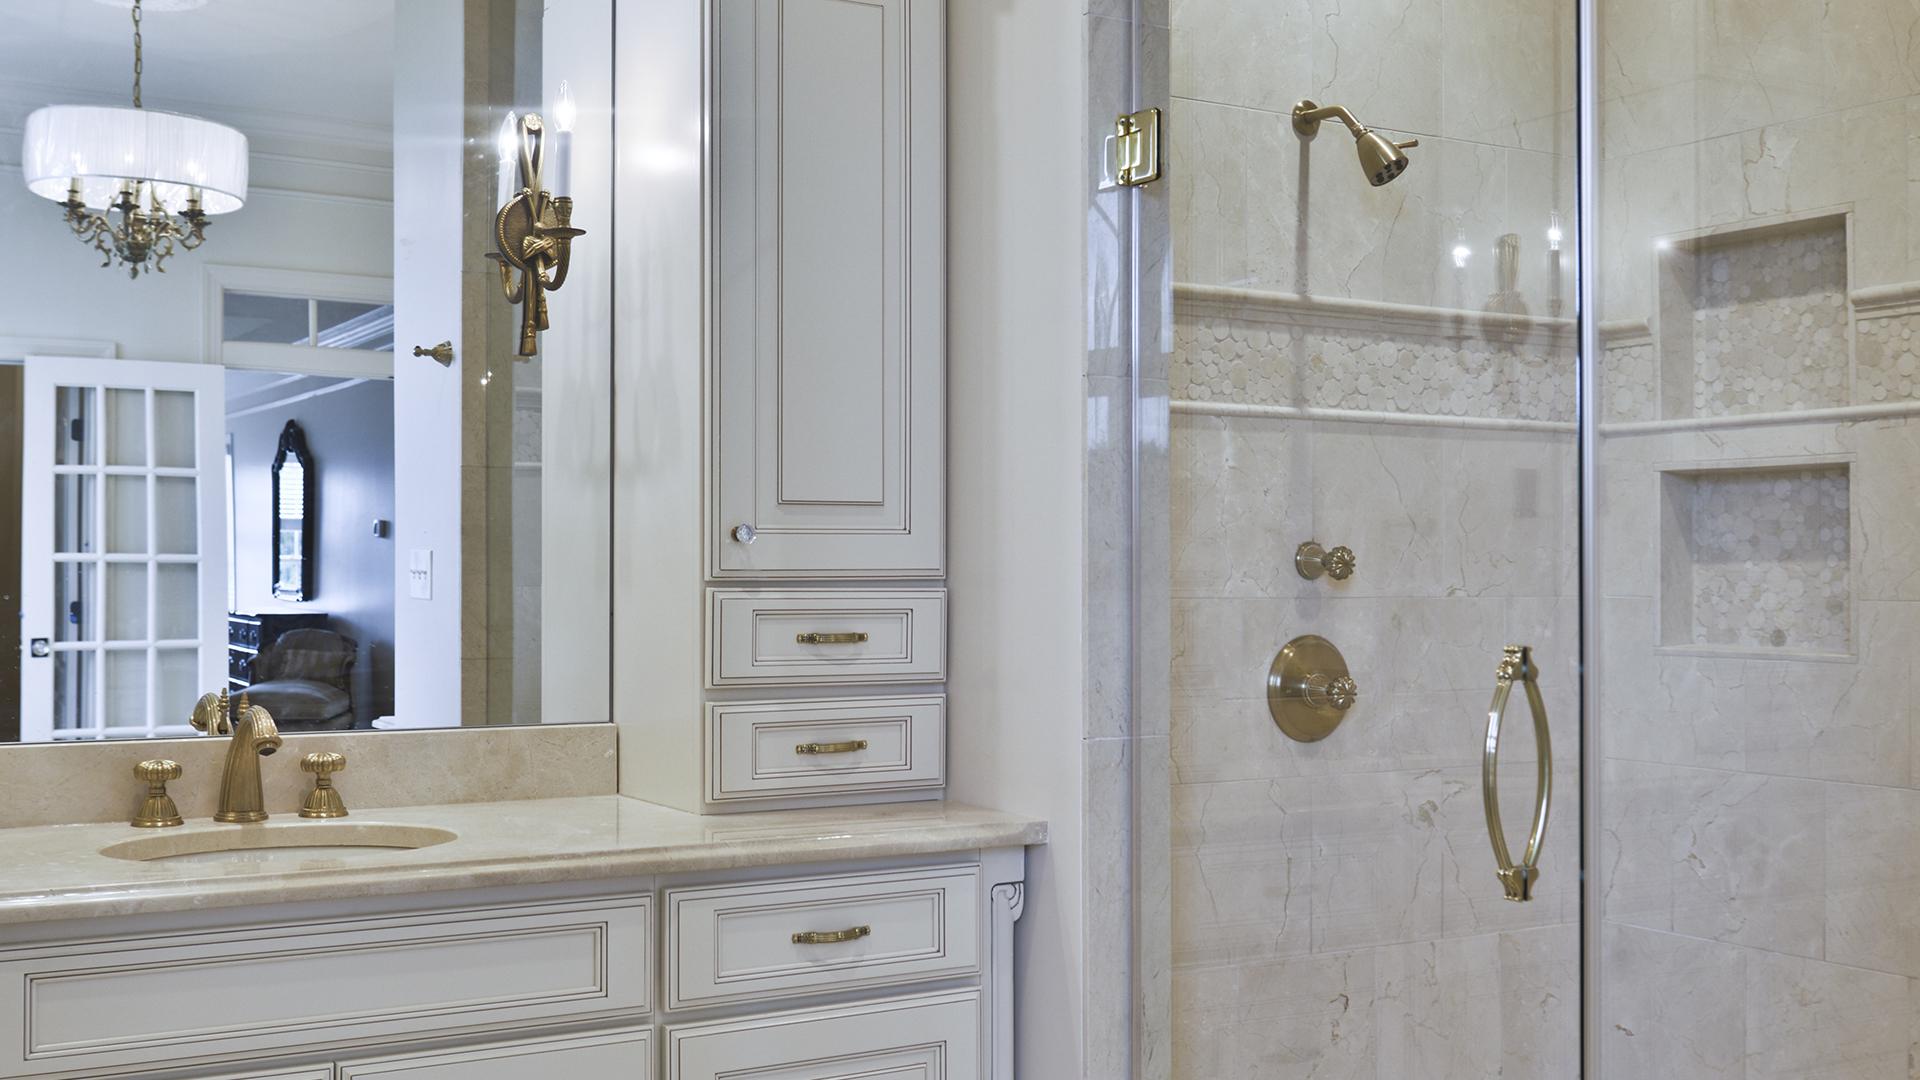 2018 NARI Capital CotY Grand Award Winner, Residential Bath Over $100,000